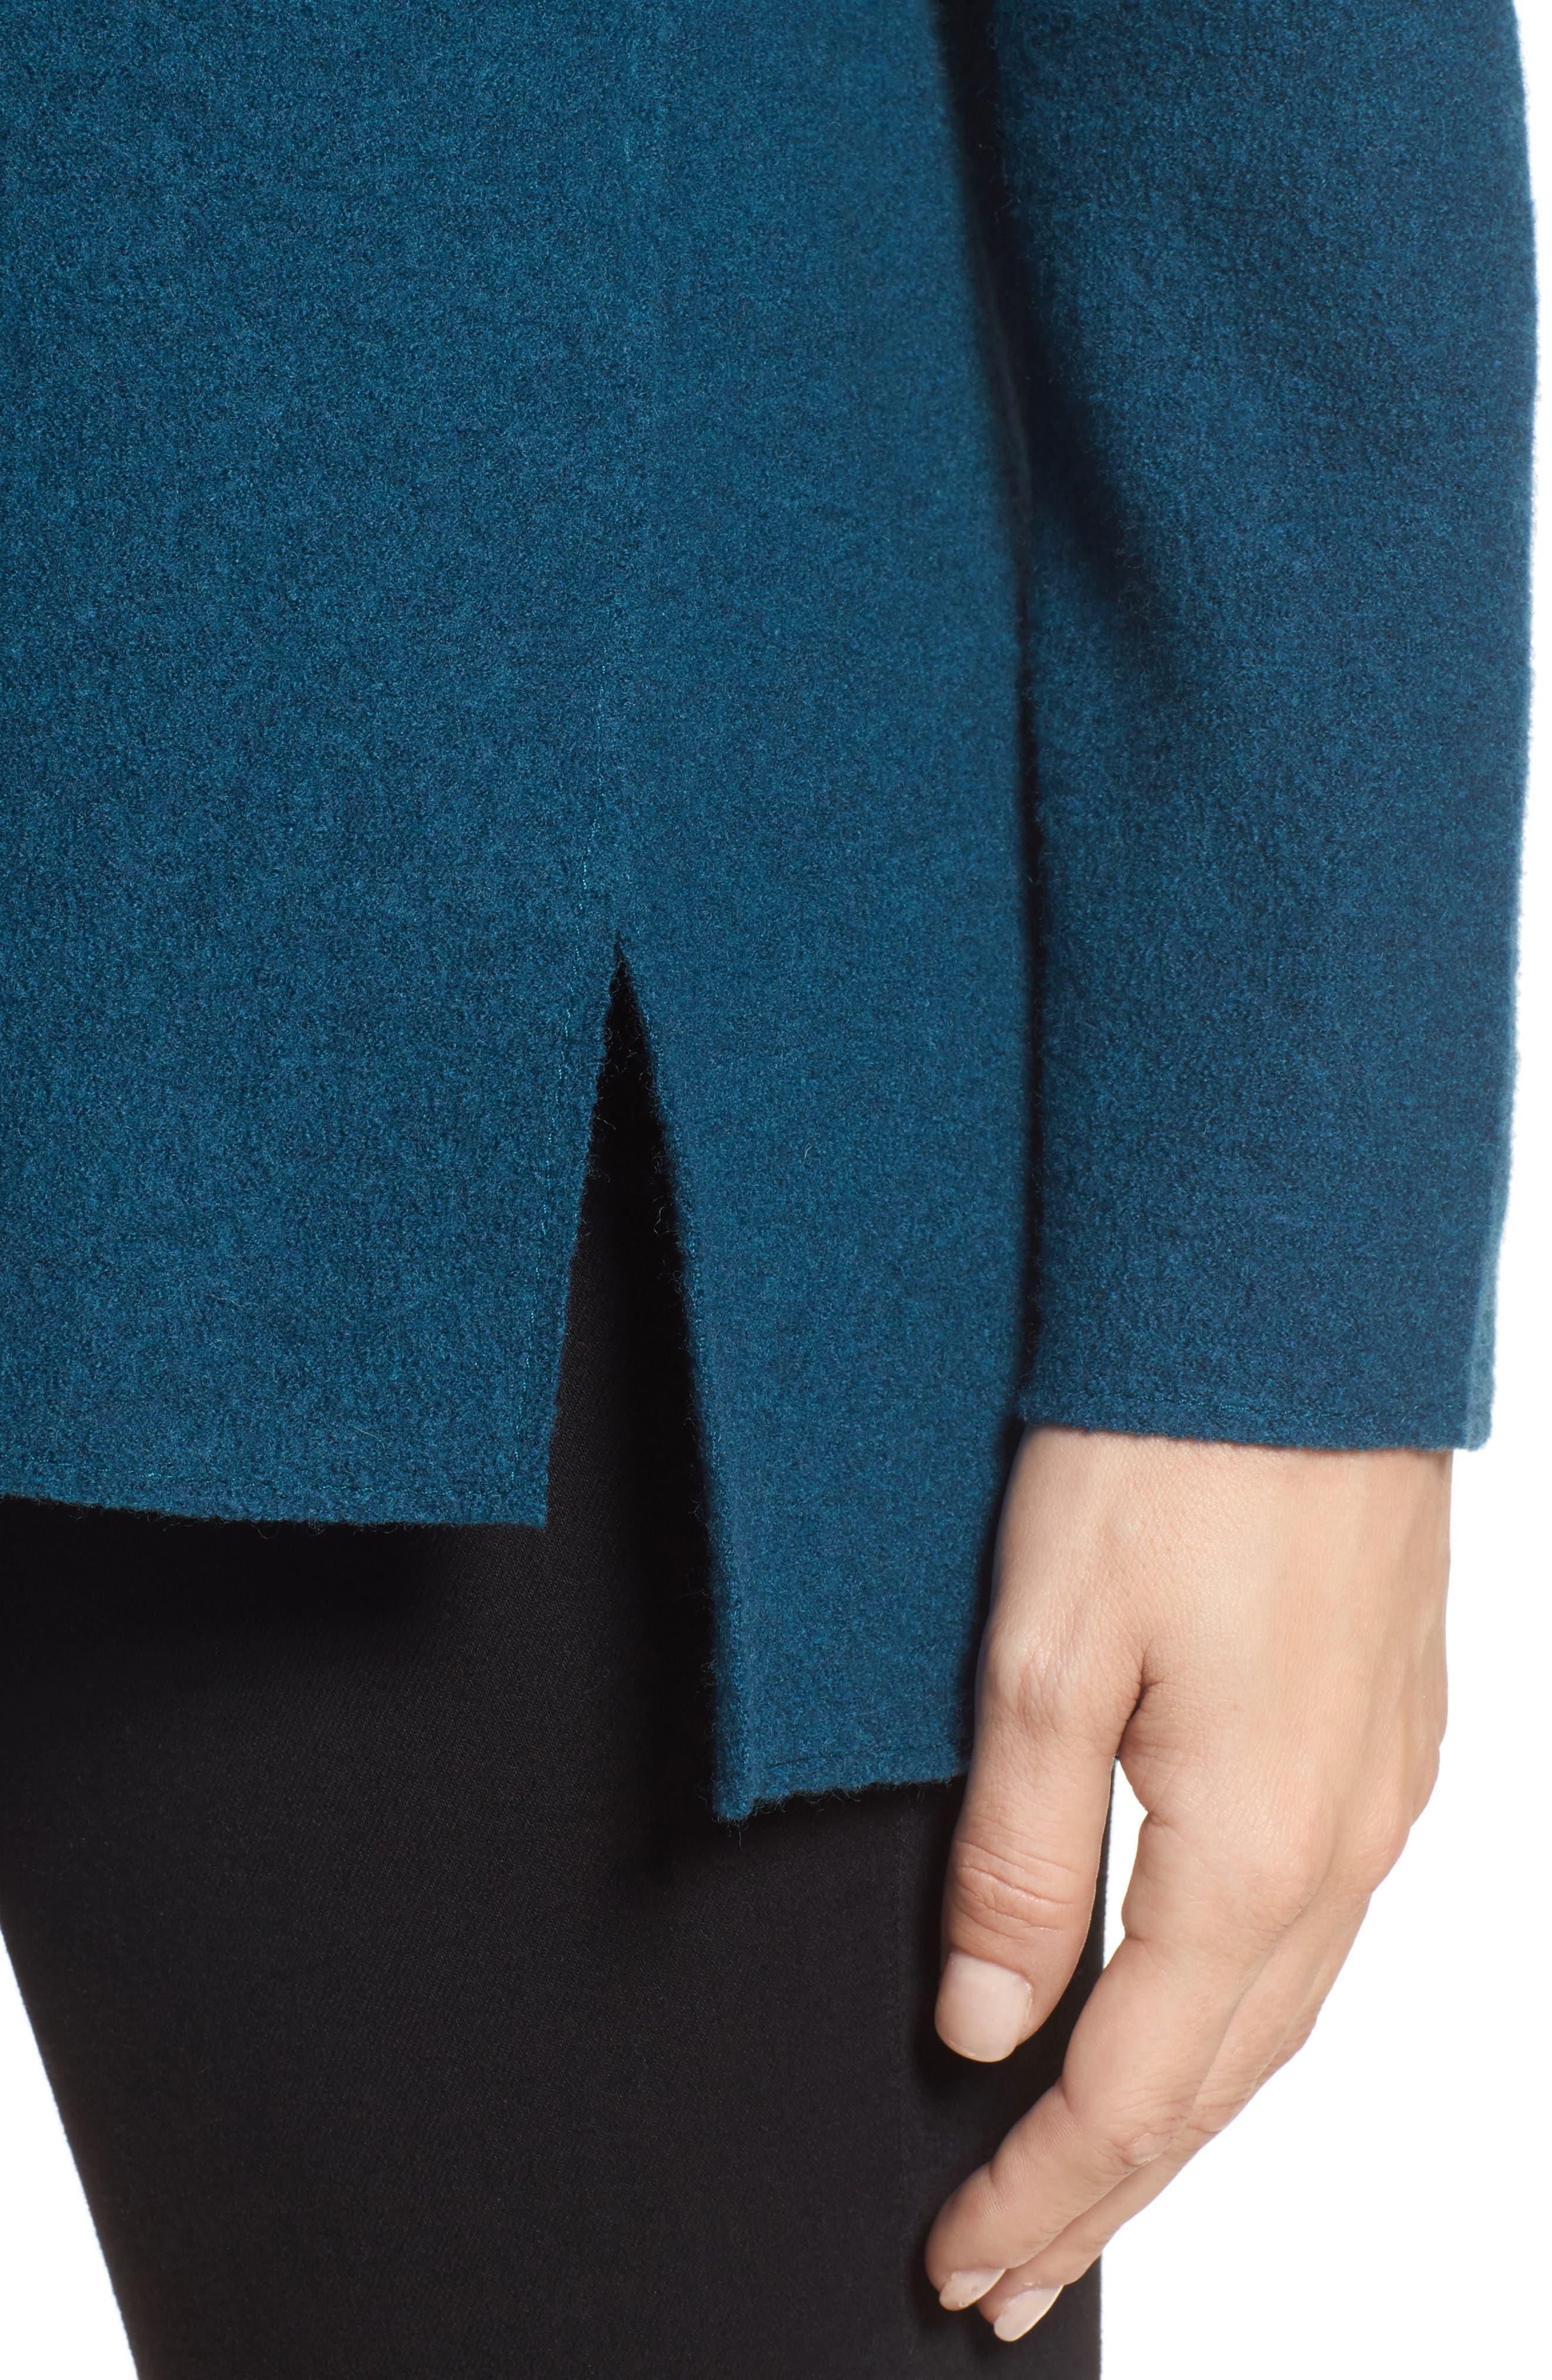 Boiled Merino Wool Top,                             Alternate thumbnail 4, color,                             Blue Spruce